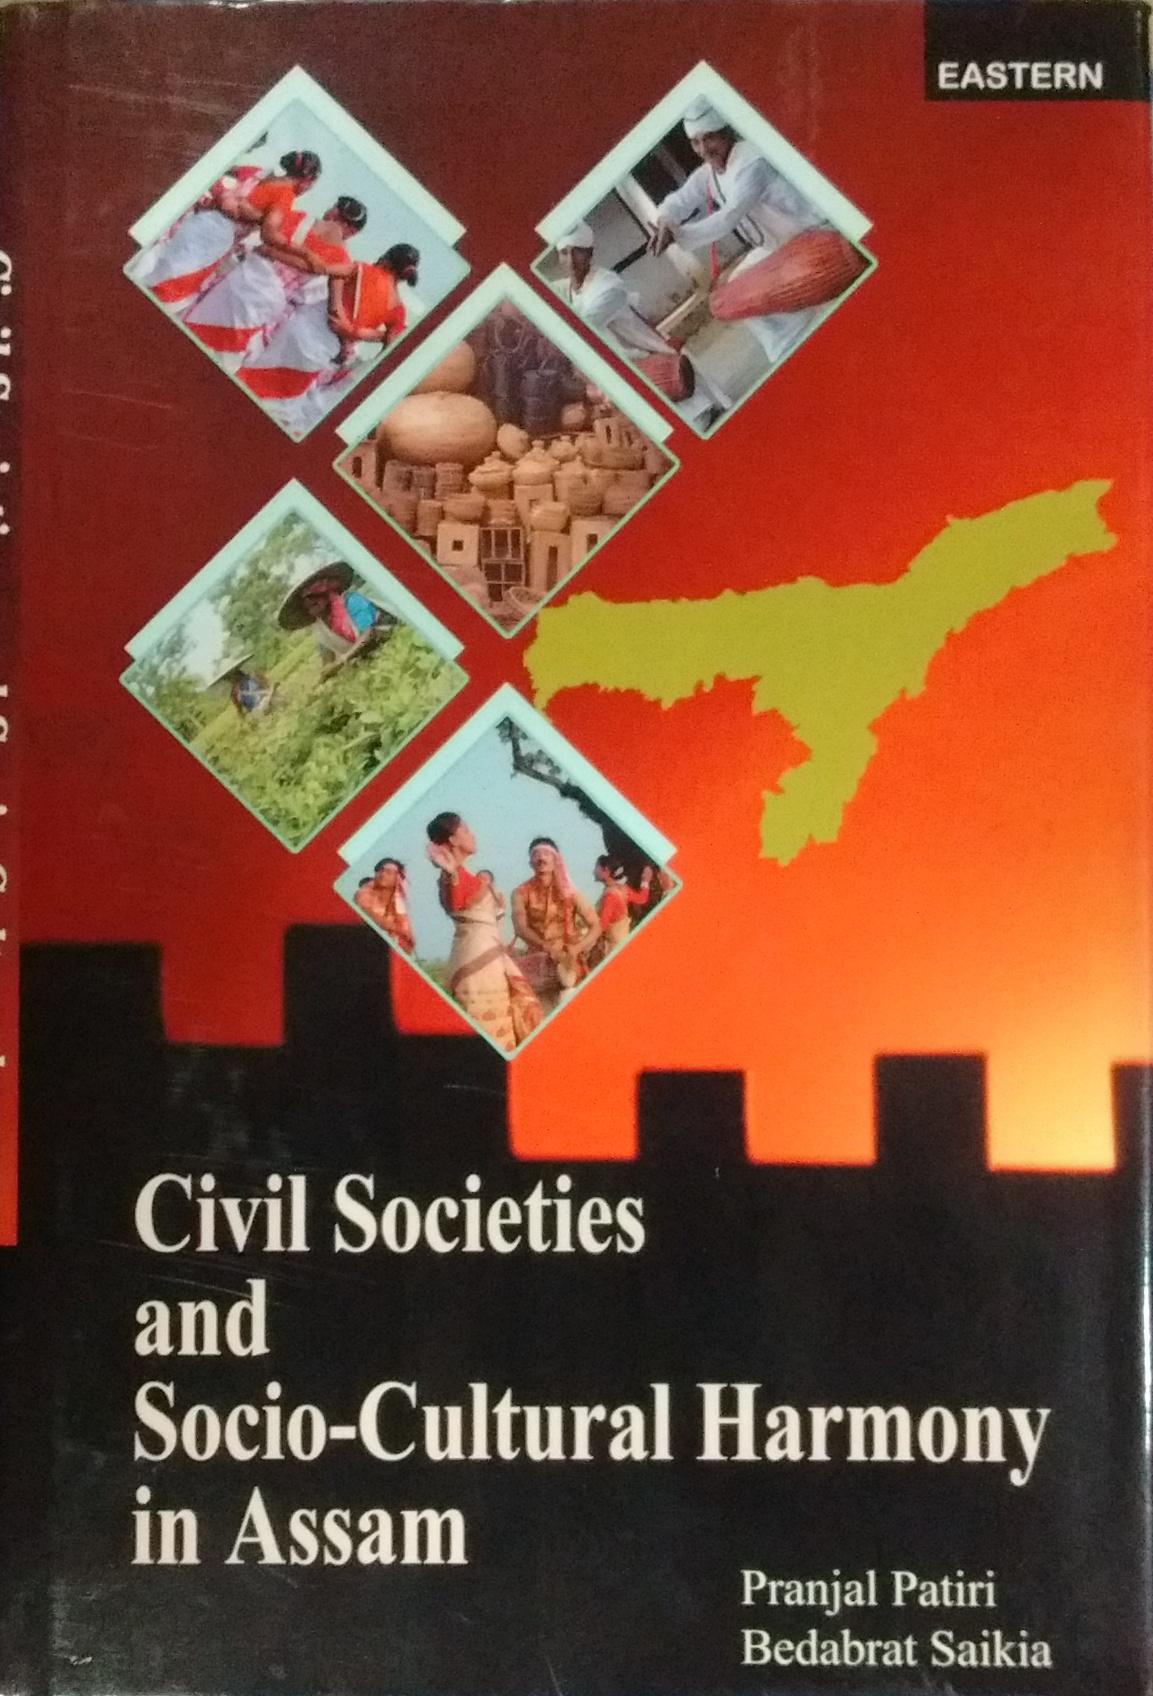 Civil Societies and Socio-Cultural Harmony in Assa…